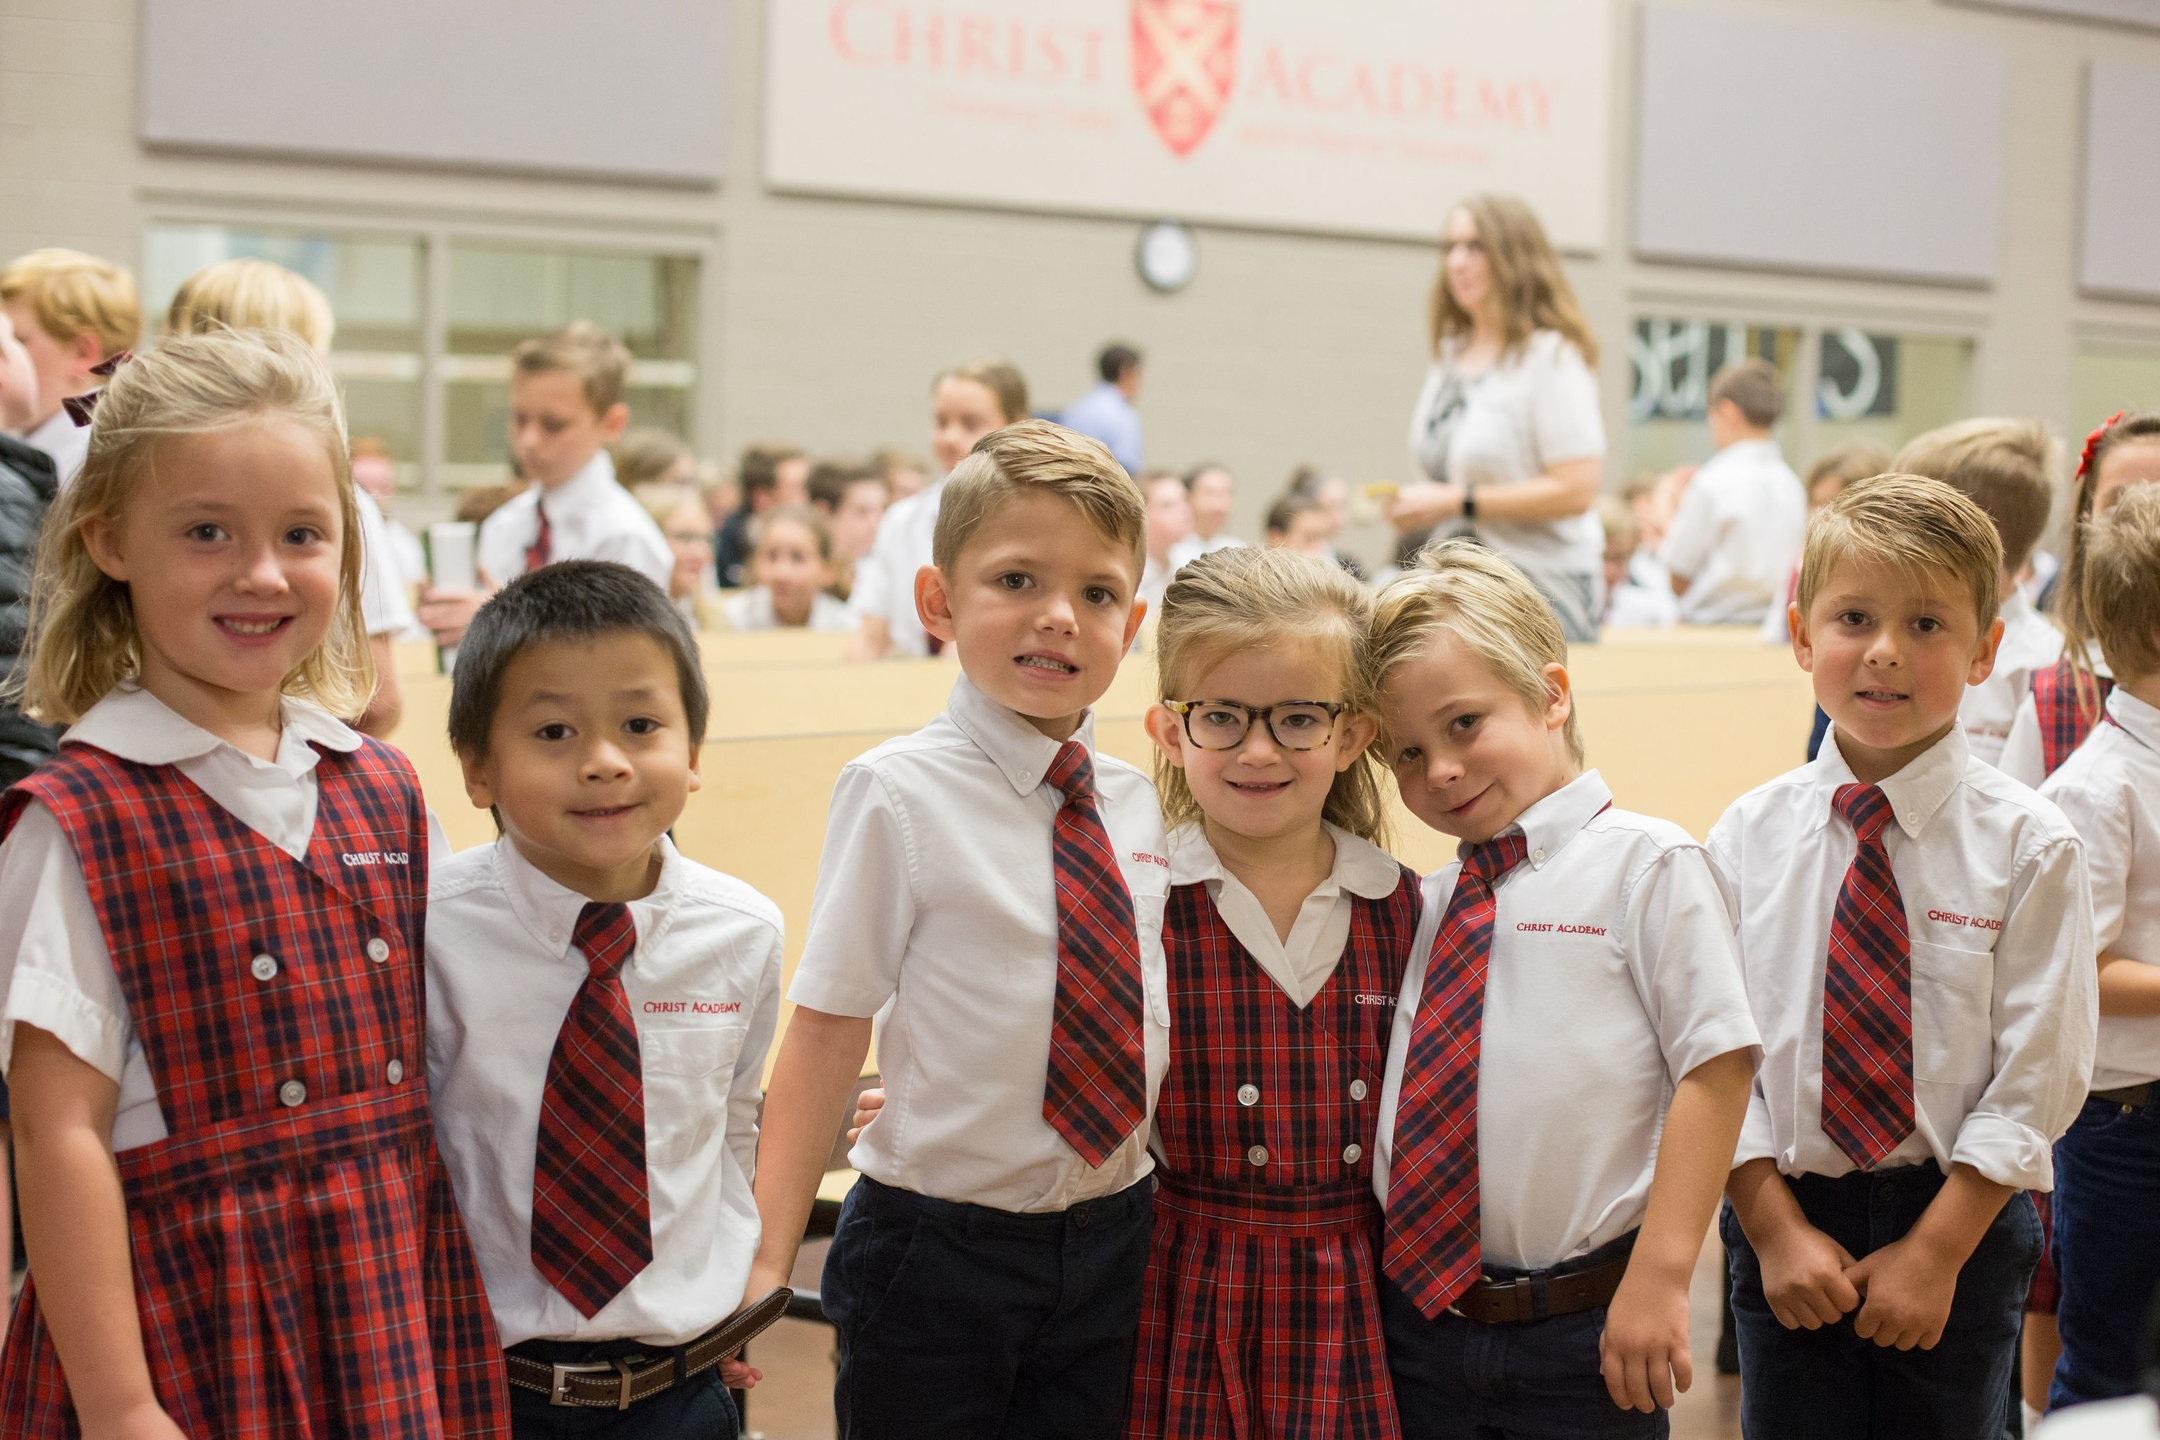 christ-academy-back-to-school-uniforms-school-supply.jpg